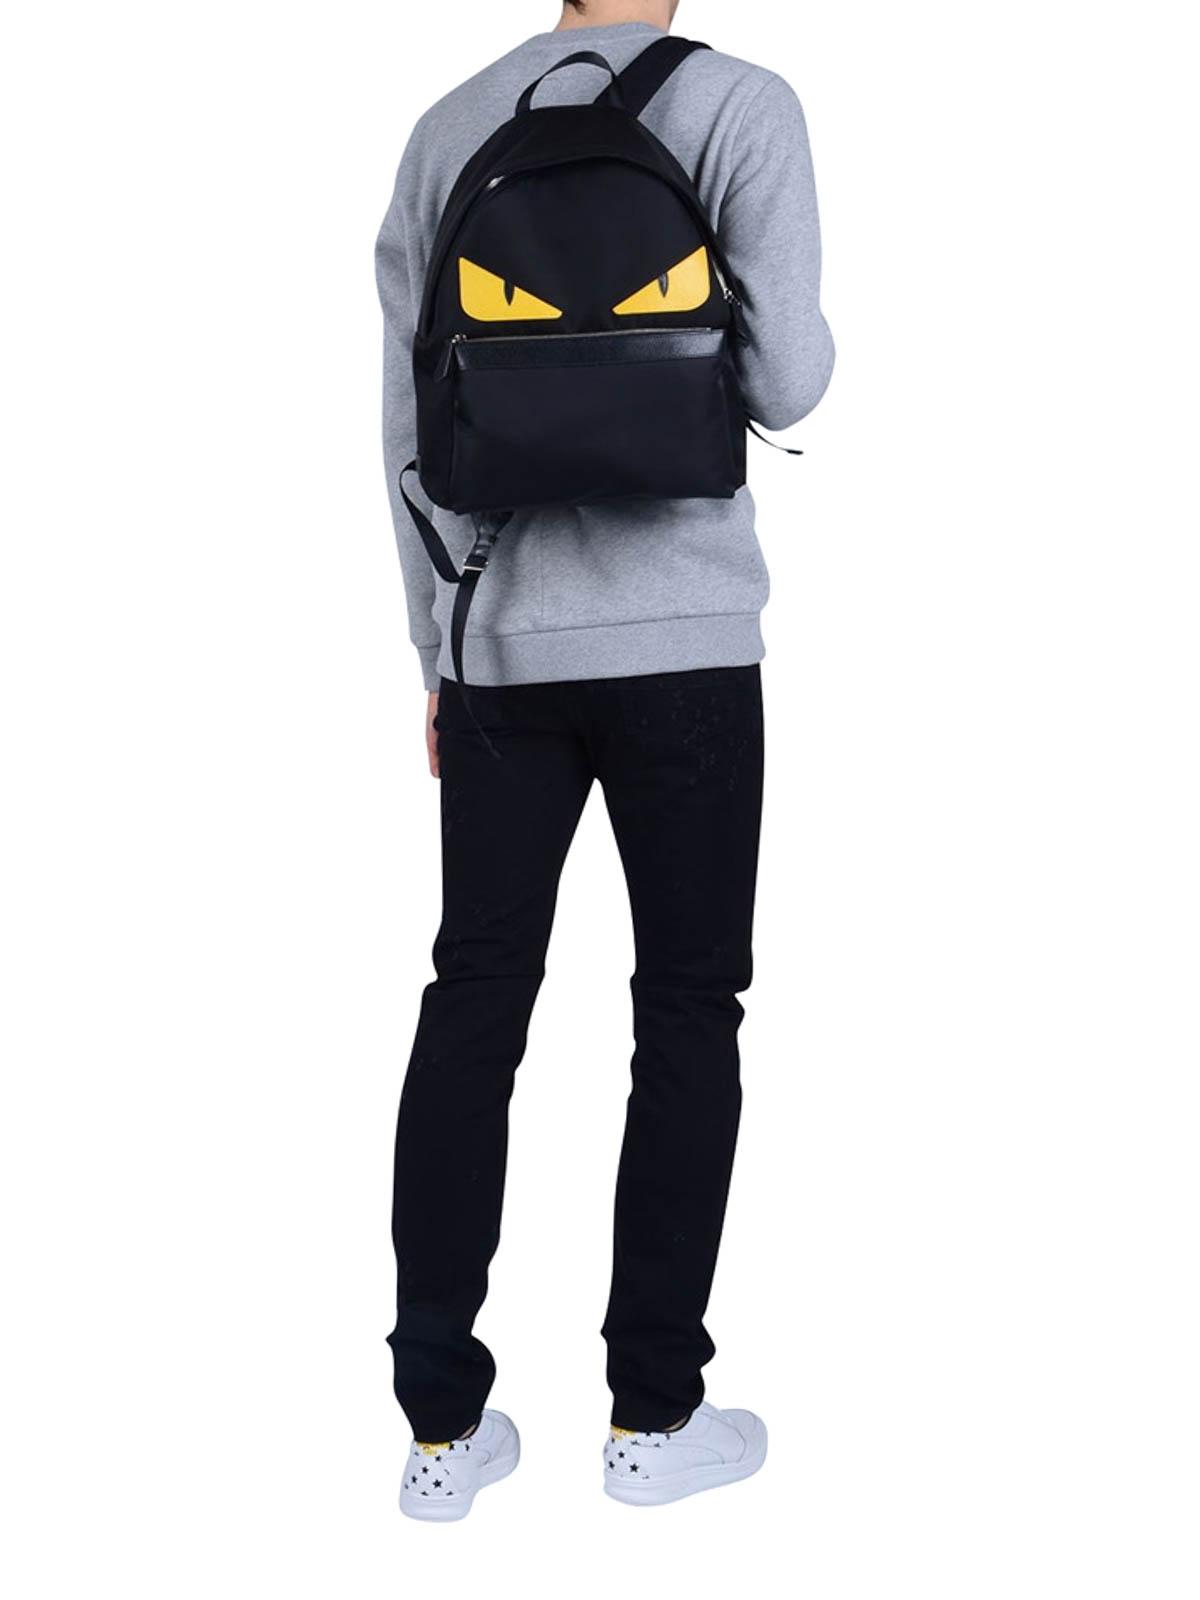 14a677f2010 ... FENDI buy online Bag Bug nylon backpack huge selection of db776 12f4a  ...